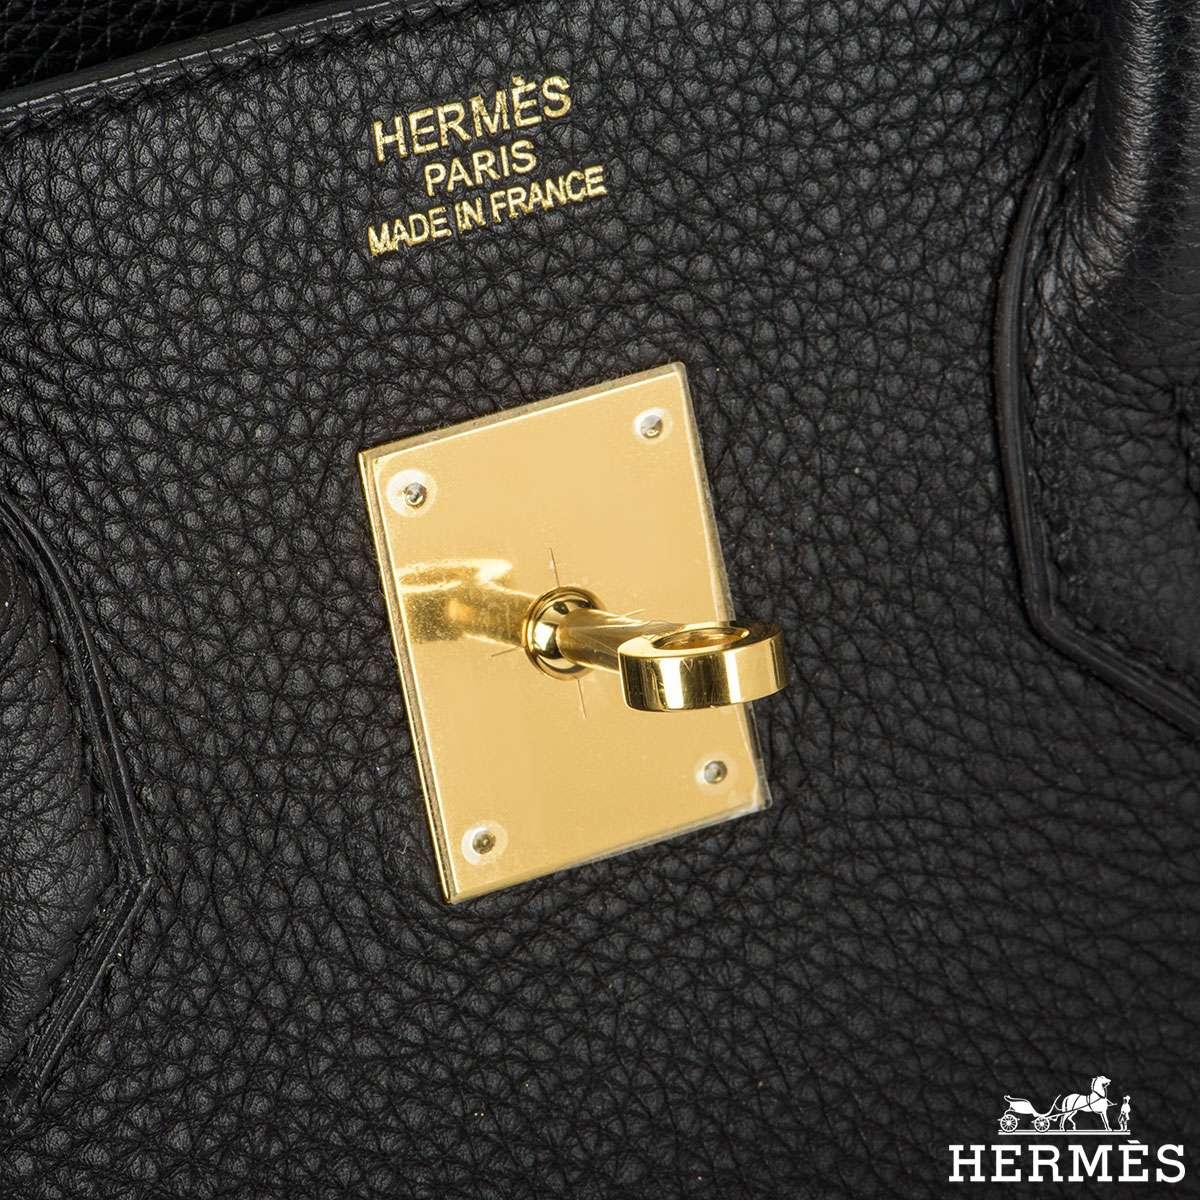 Hermes Birkin 35 cm Black togo leather handbag